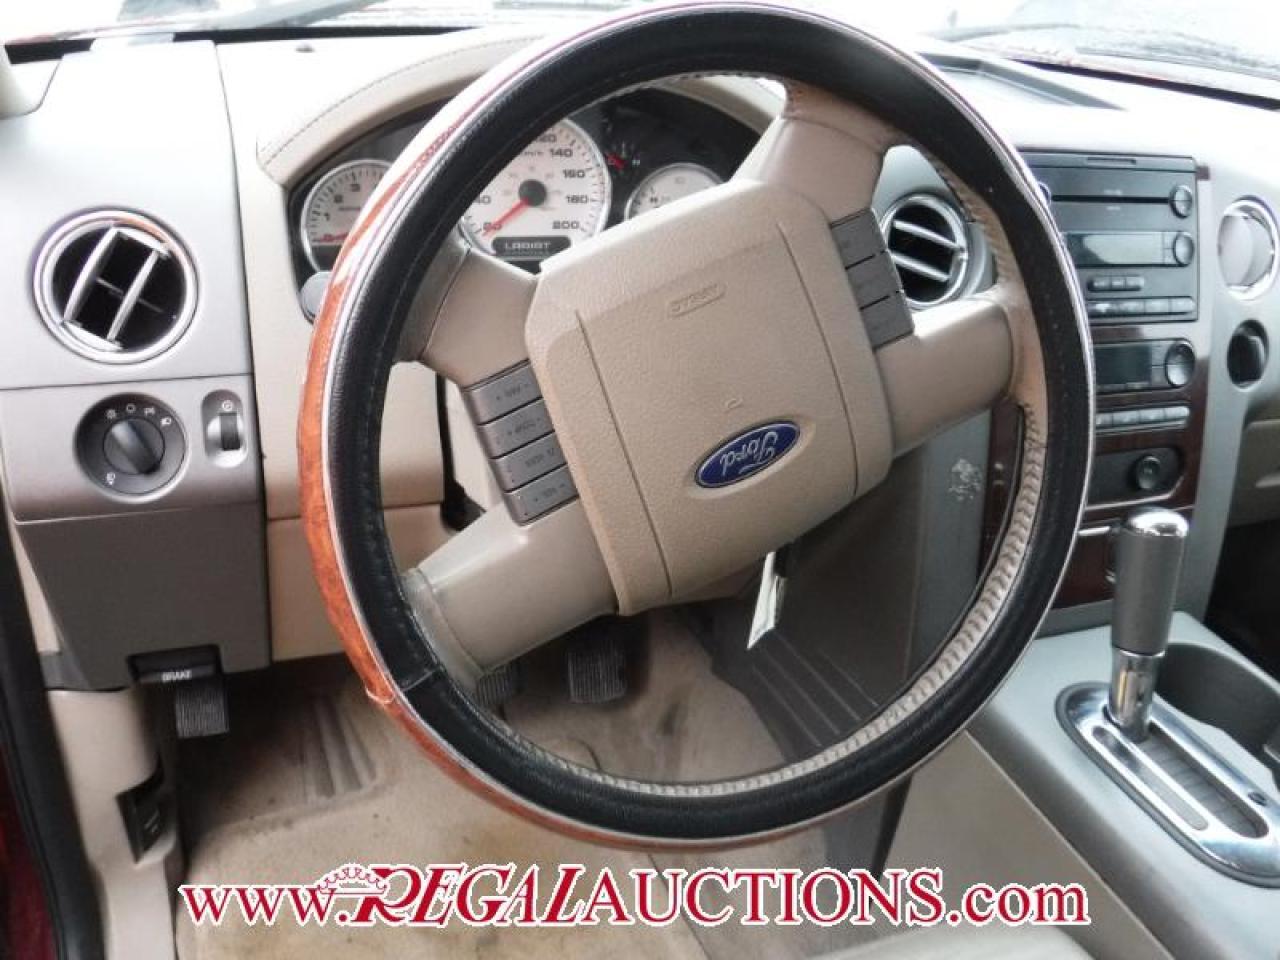 2006 Ford F-150 LARIAT SuperCrew 4WD